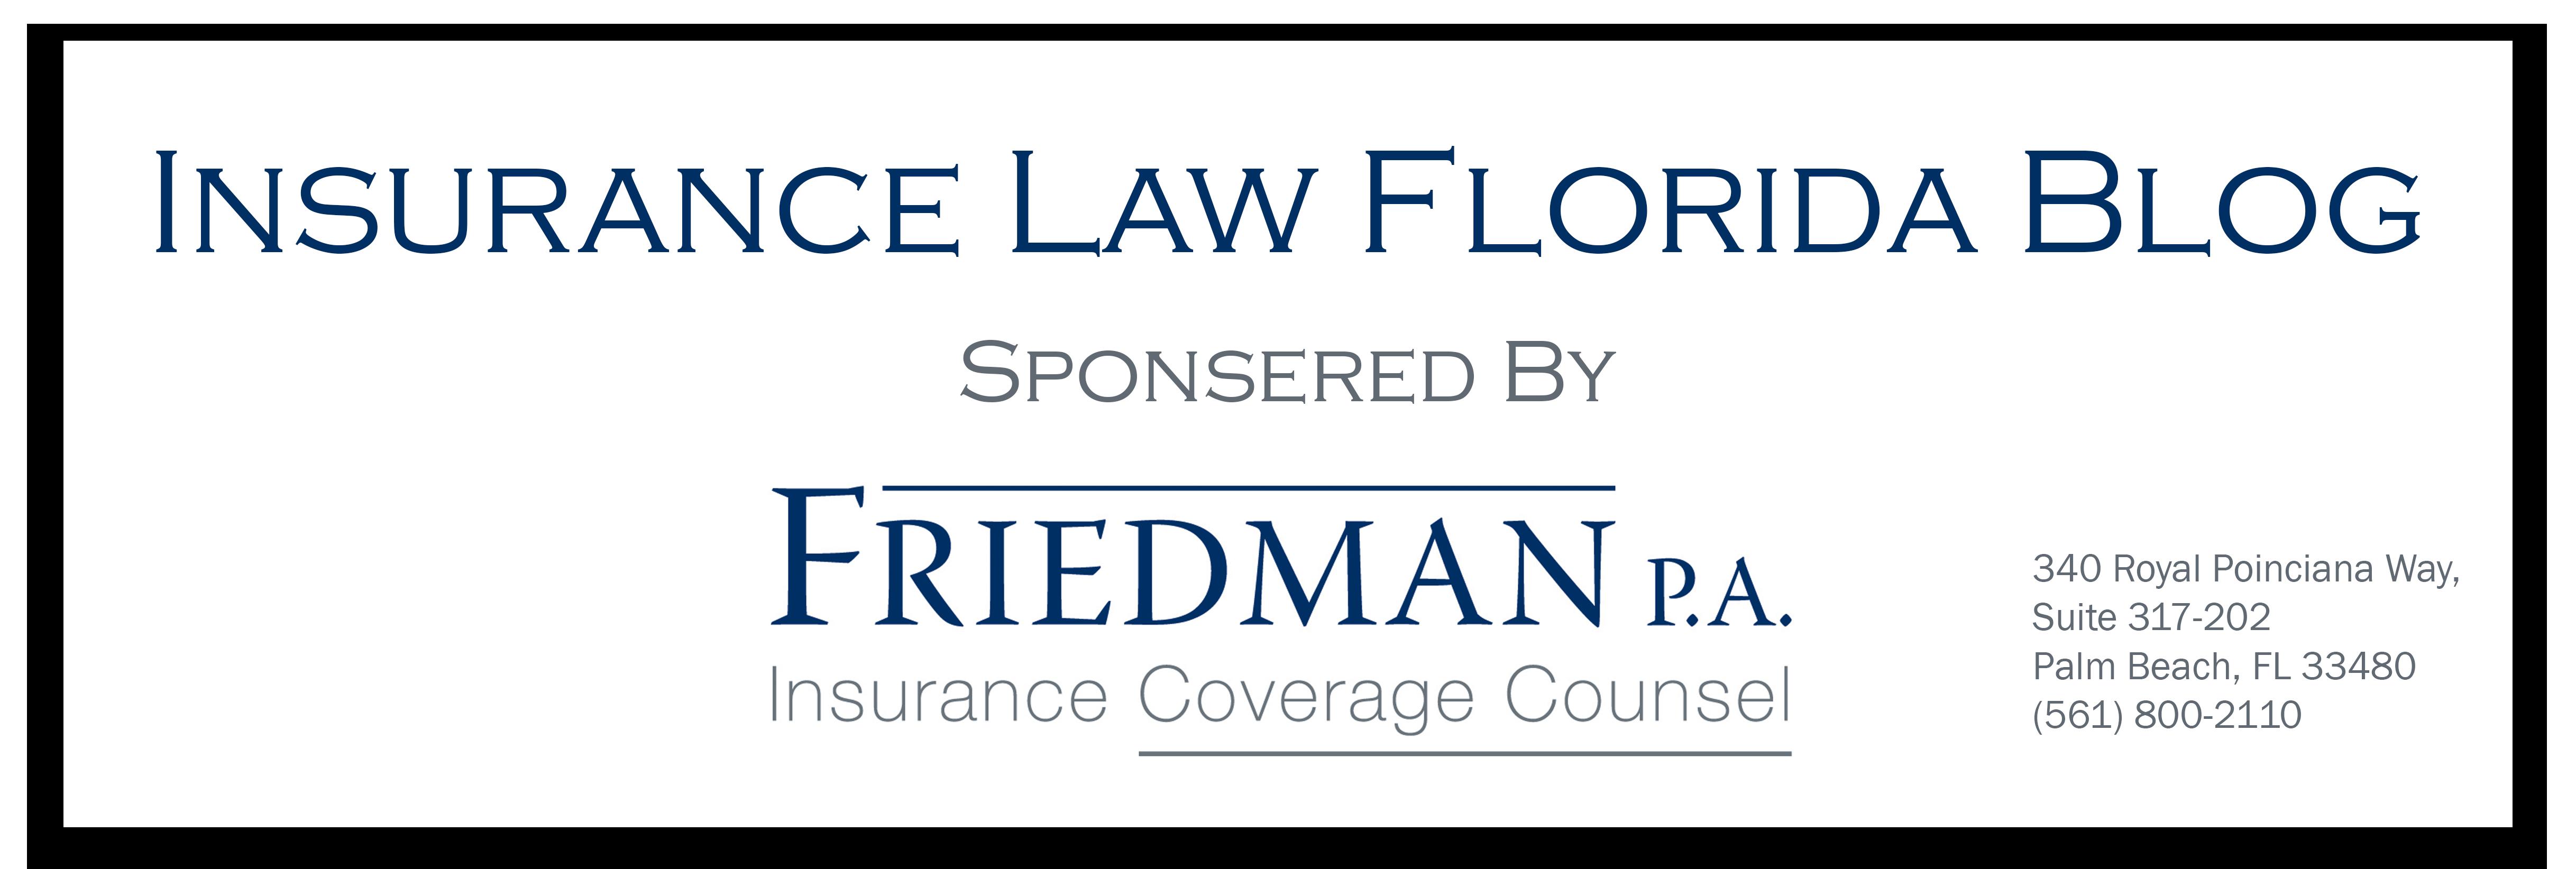 Insurance Law Florida